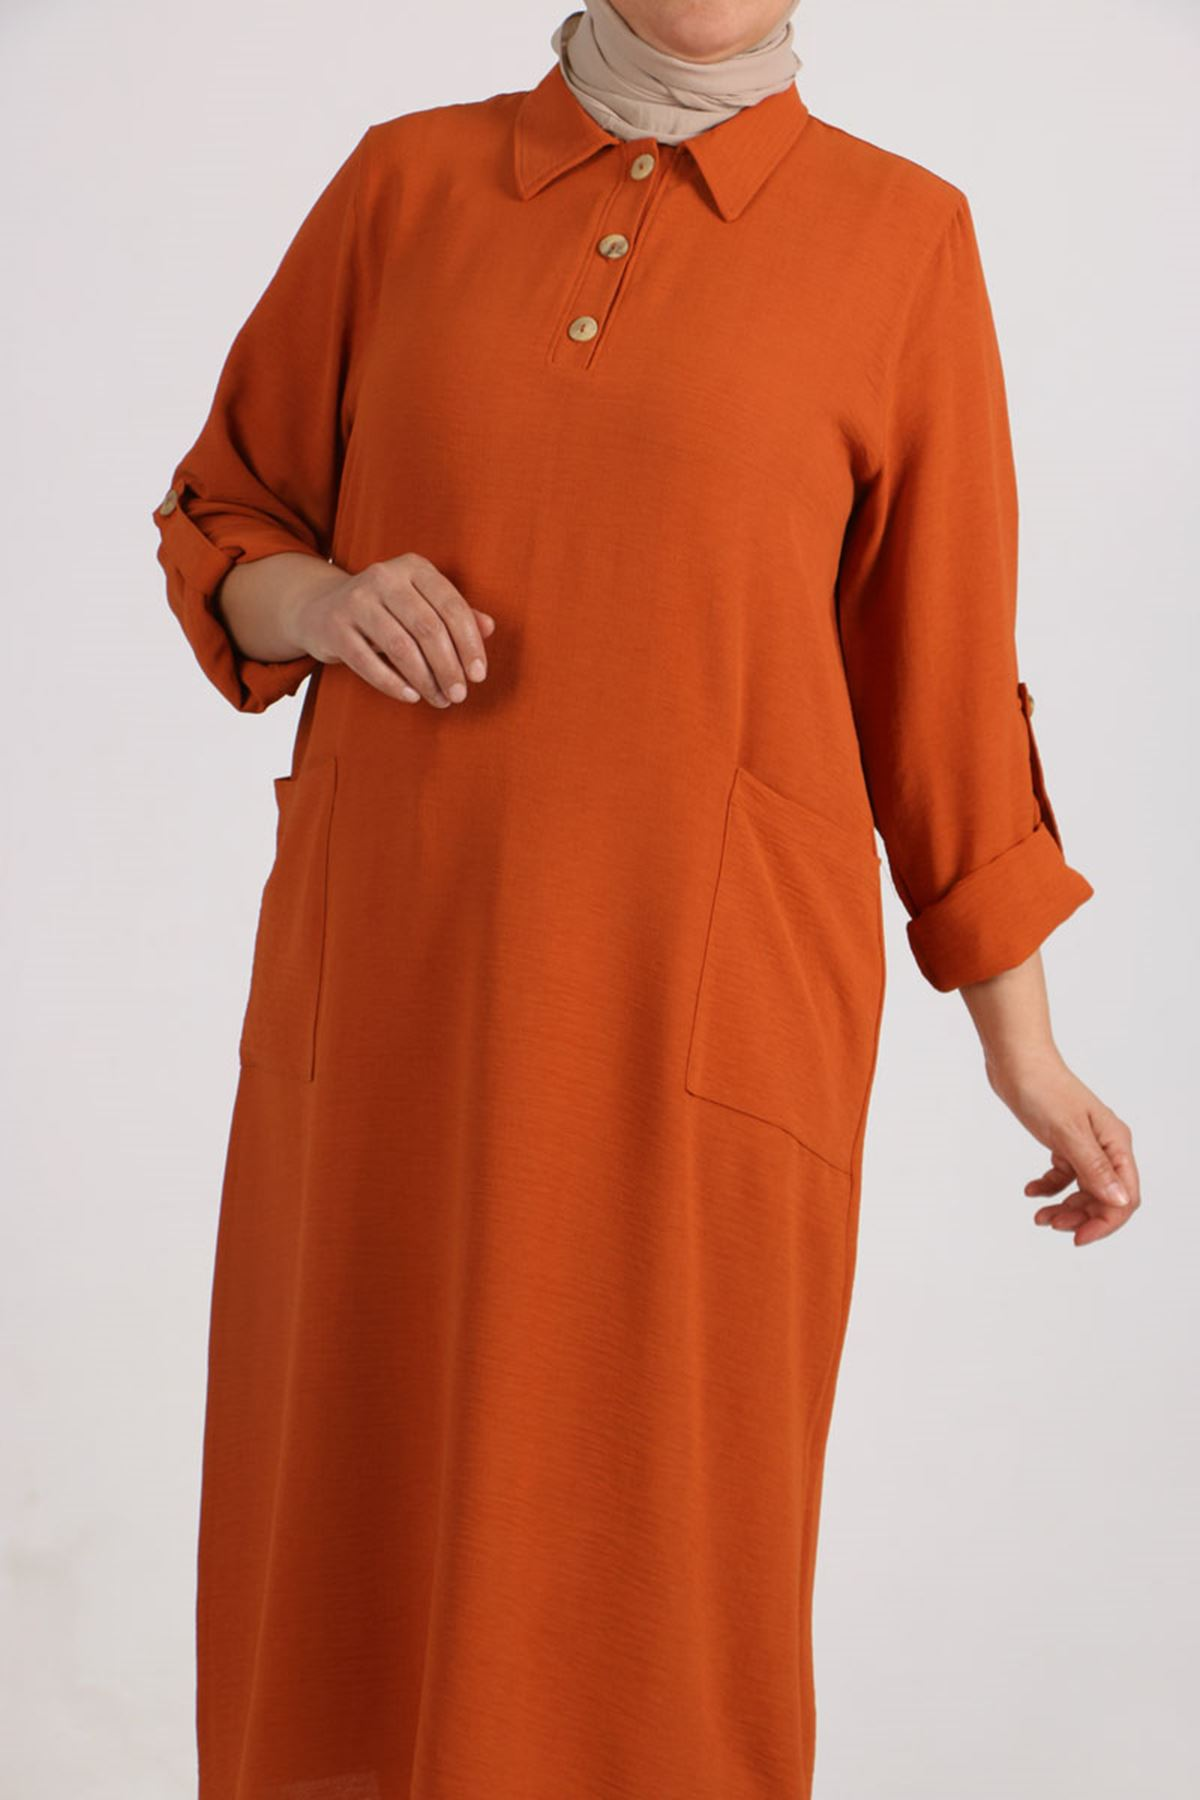 8408 Plus Size  Tunic-  Terra Cotta